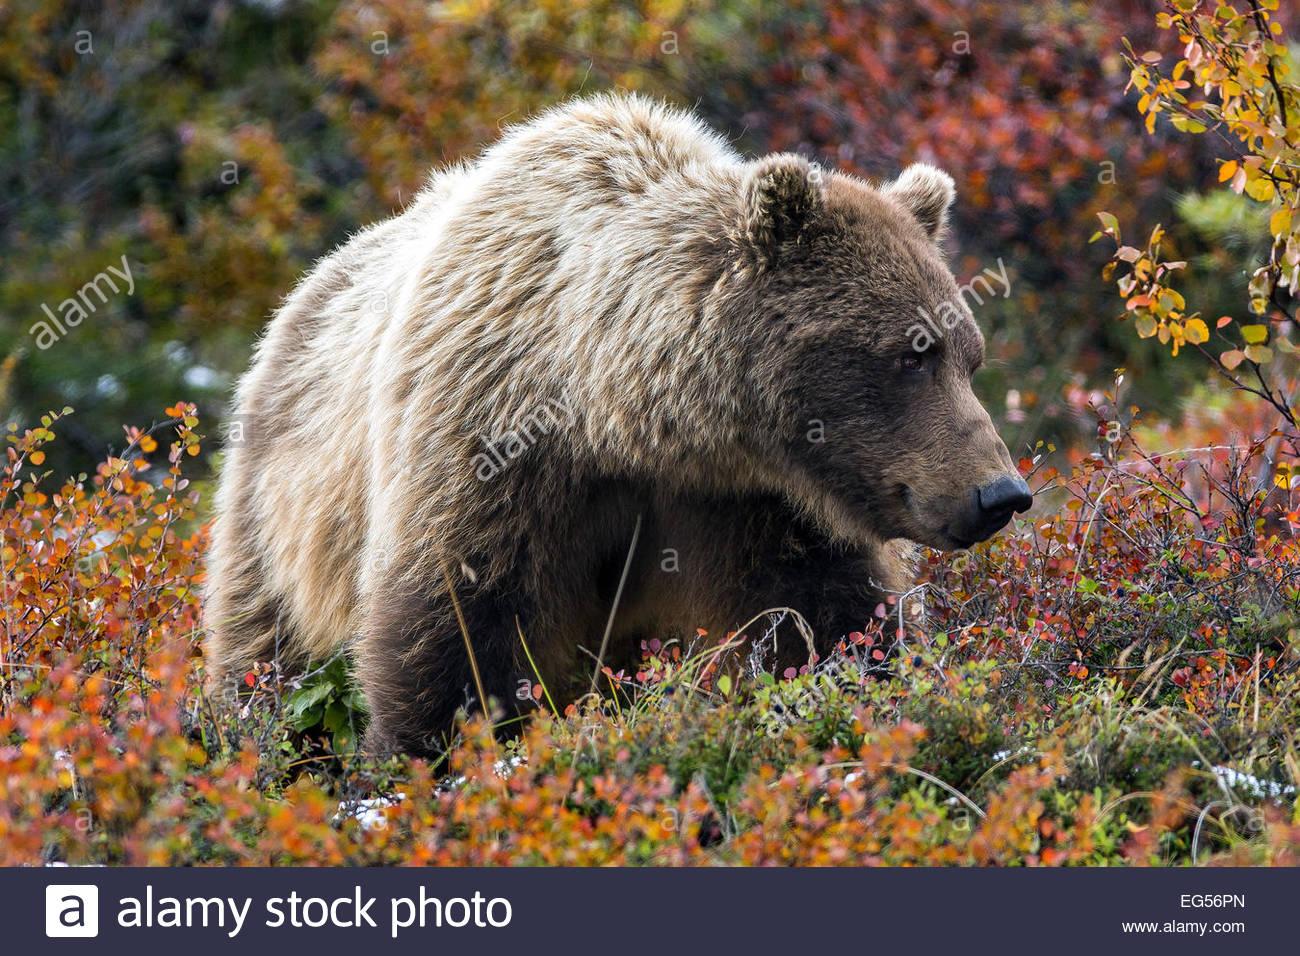 Grizzly bear (ursus arctos horribilis - female) in Denali national Park - Alaska - Stock Image